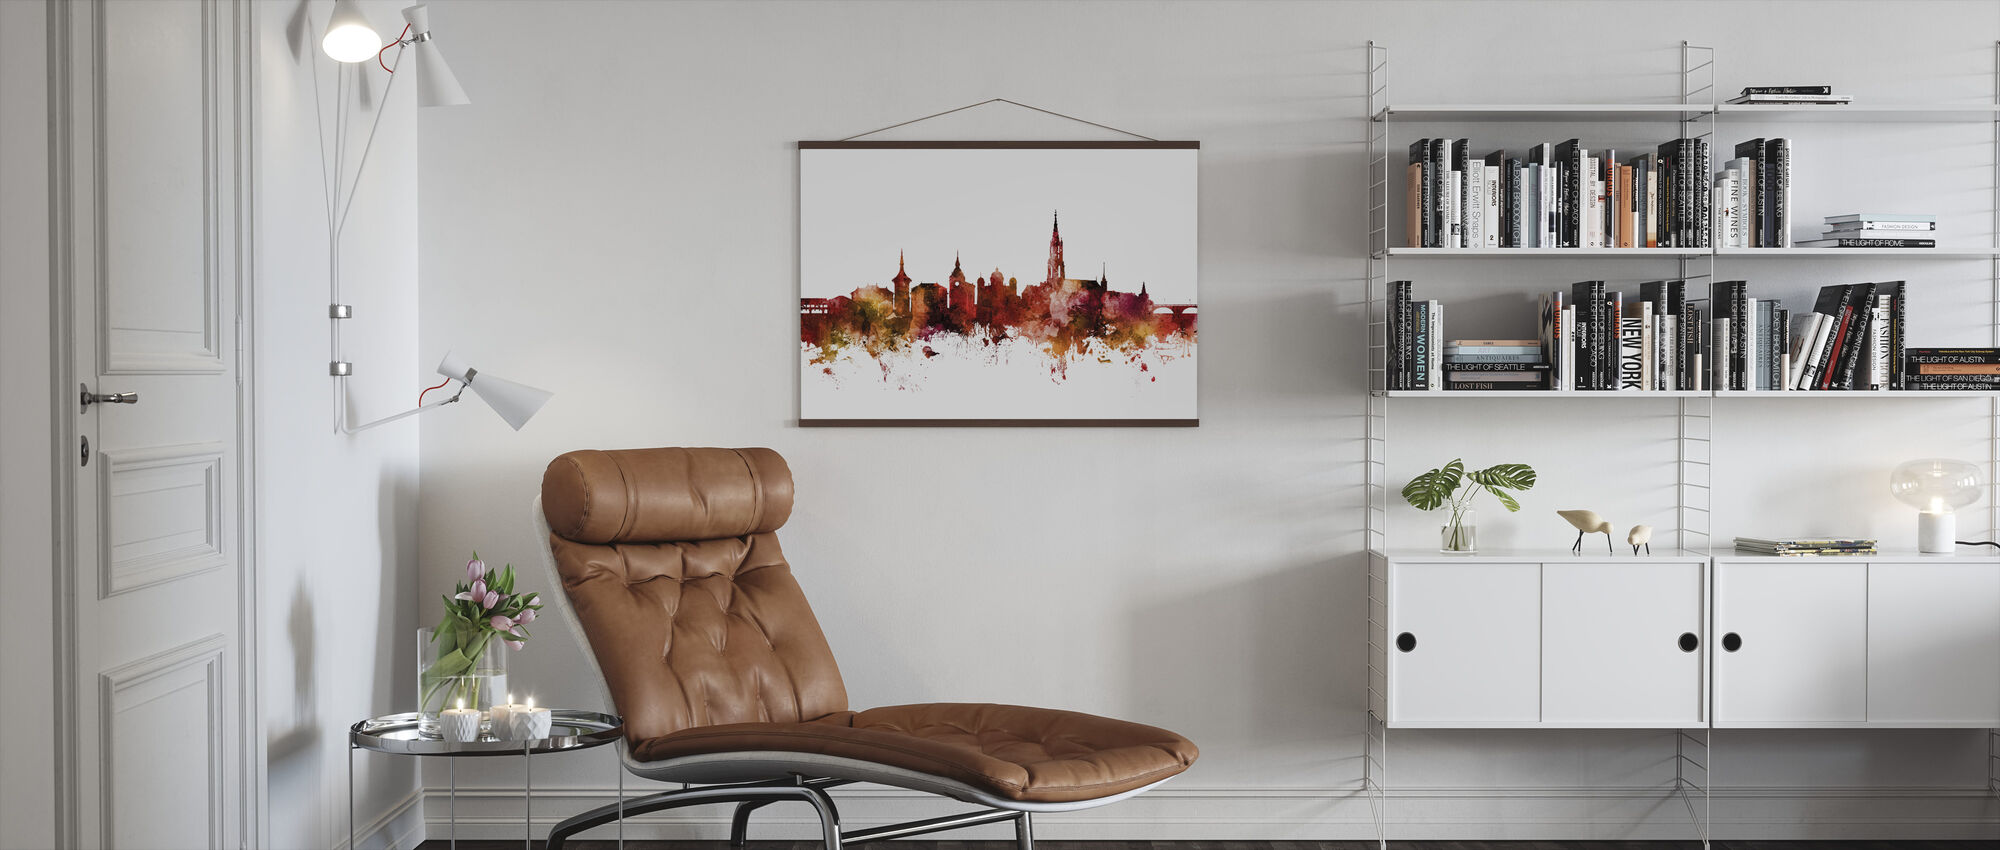 Skyline van Bern Zwitserland - Poster - Woonkamer